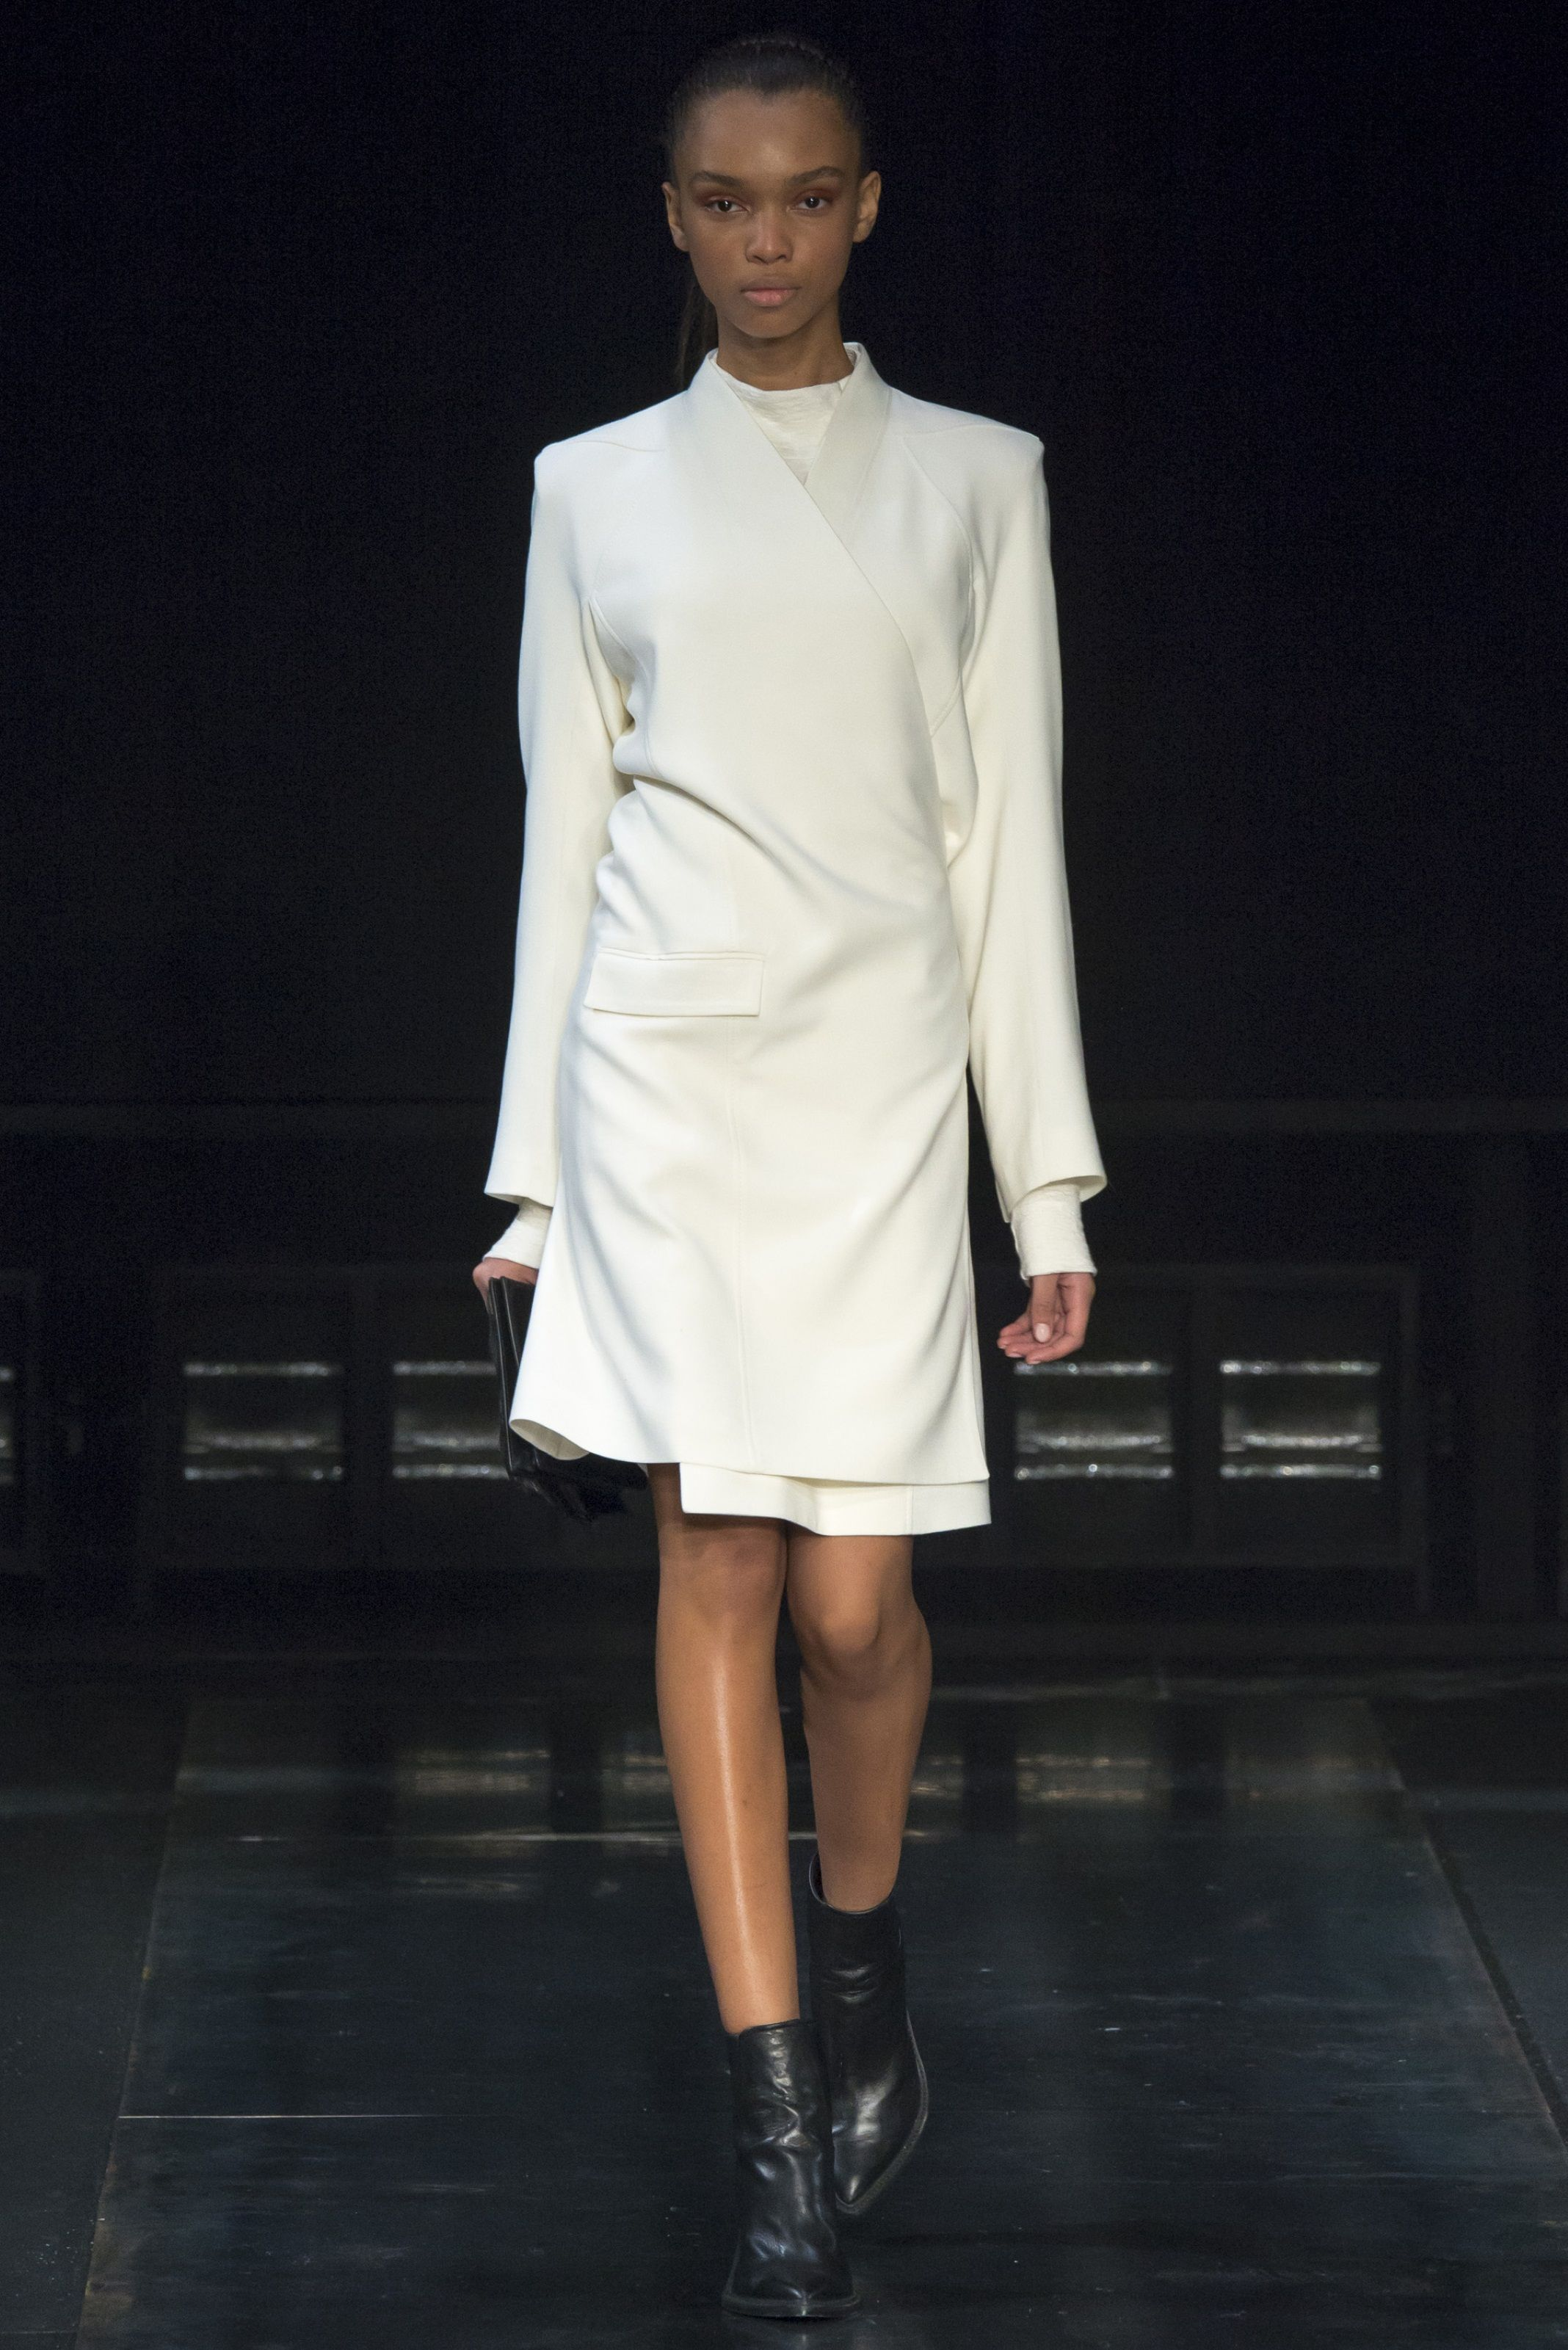 Sfilata Helmut Lang New York - Collezioni Autunno Inverno 2014-15 - Vogue 1a3fb6db640